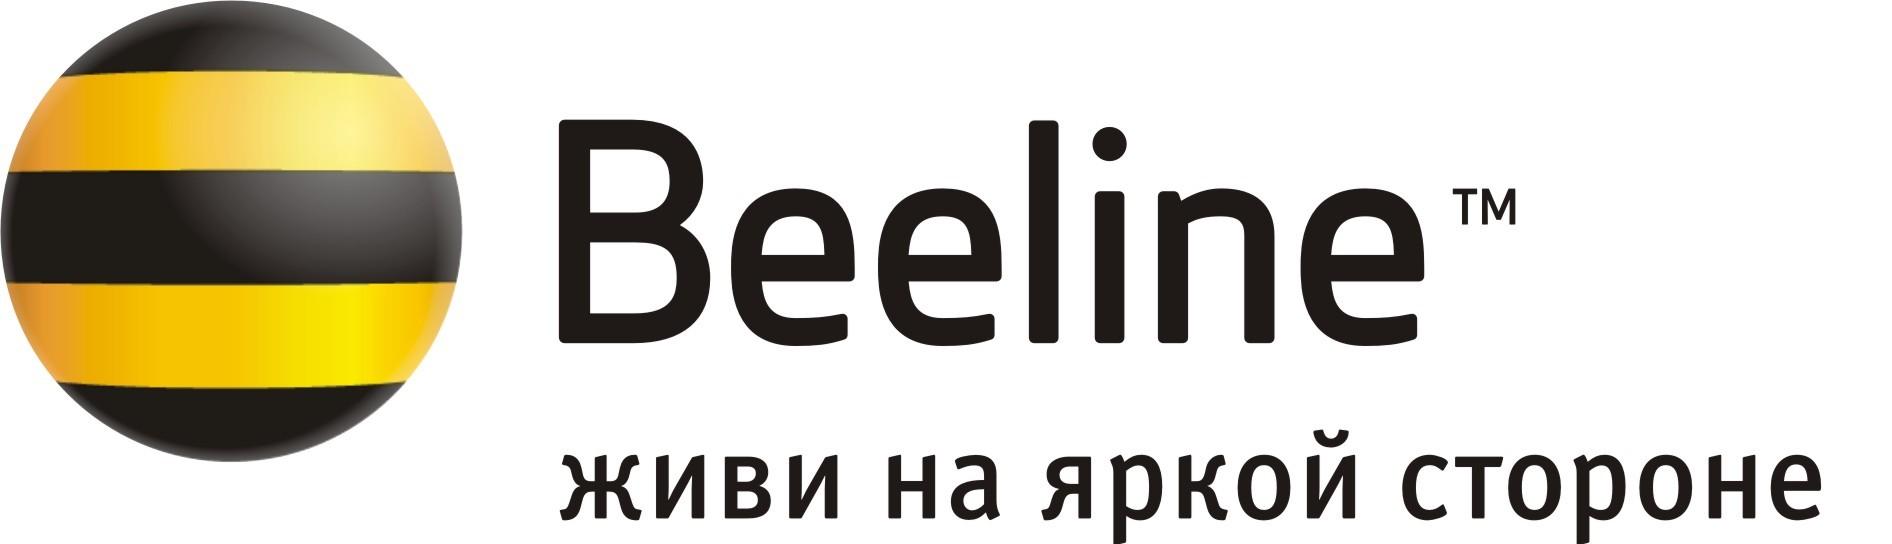 How to call the operator Beeline 27